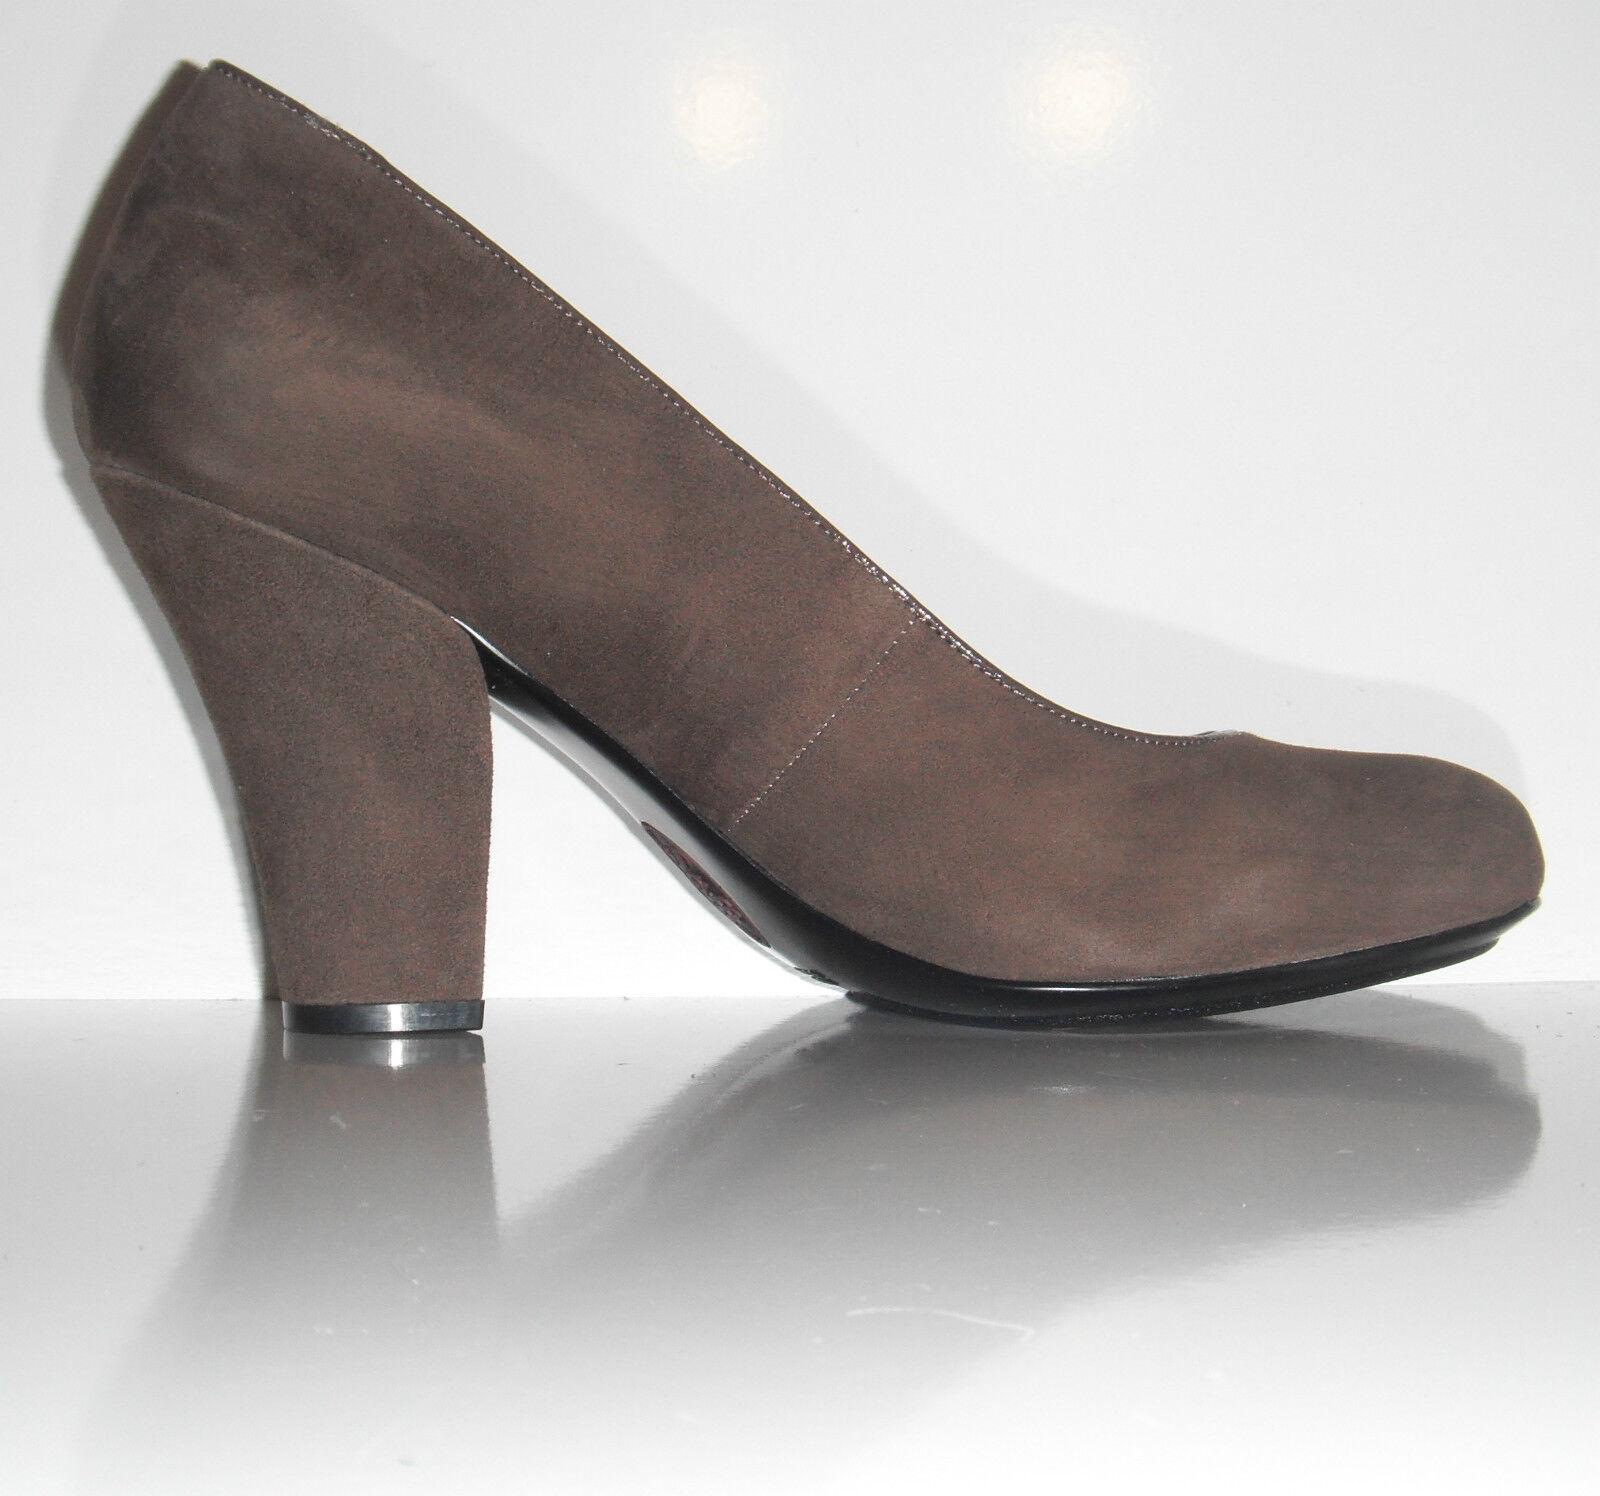 NIB  Sofft Florentina Mocha Brown Soft Suede shoes sz 6M